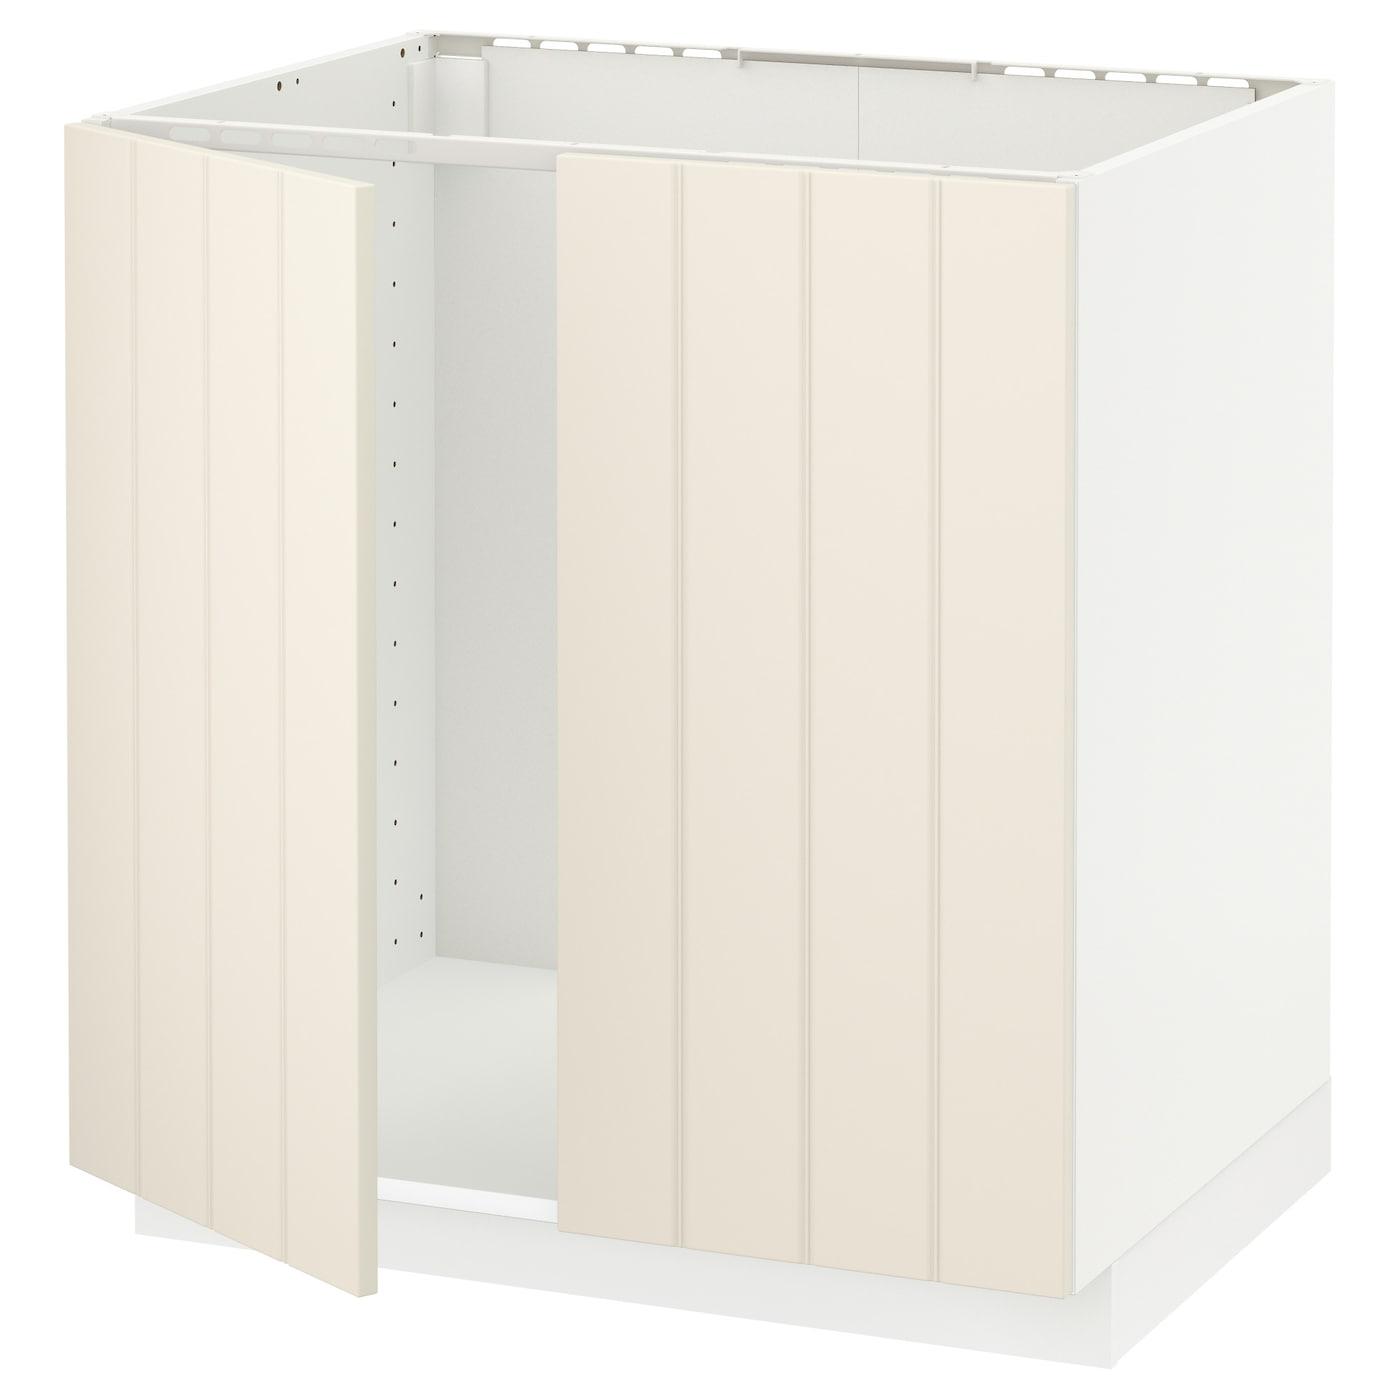 Ikea Metod Unterschrank Fur Spule 2 Turen Weiss Hittarp Elfenbeinweiss 80x60 Cm Moebel Suchmaschine Ladendirekt De